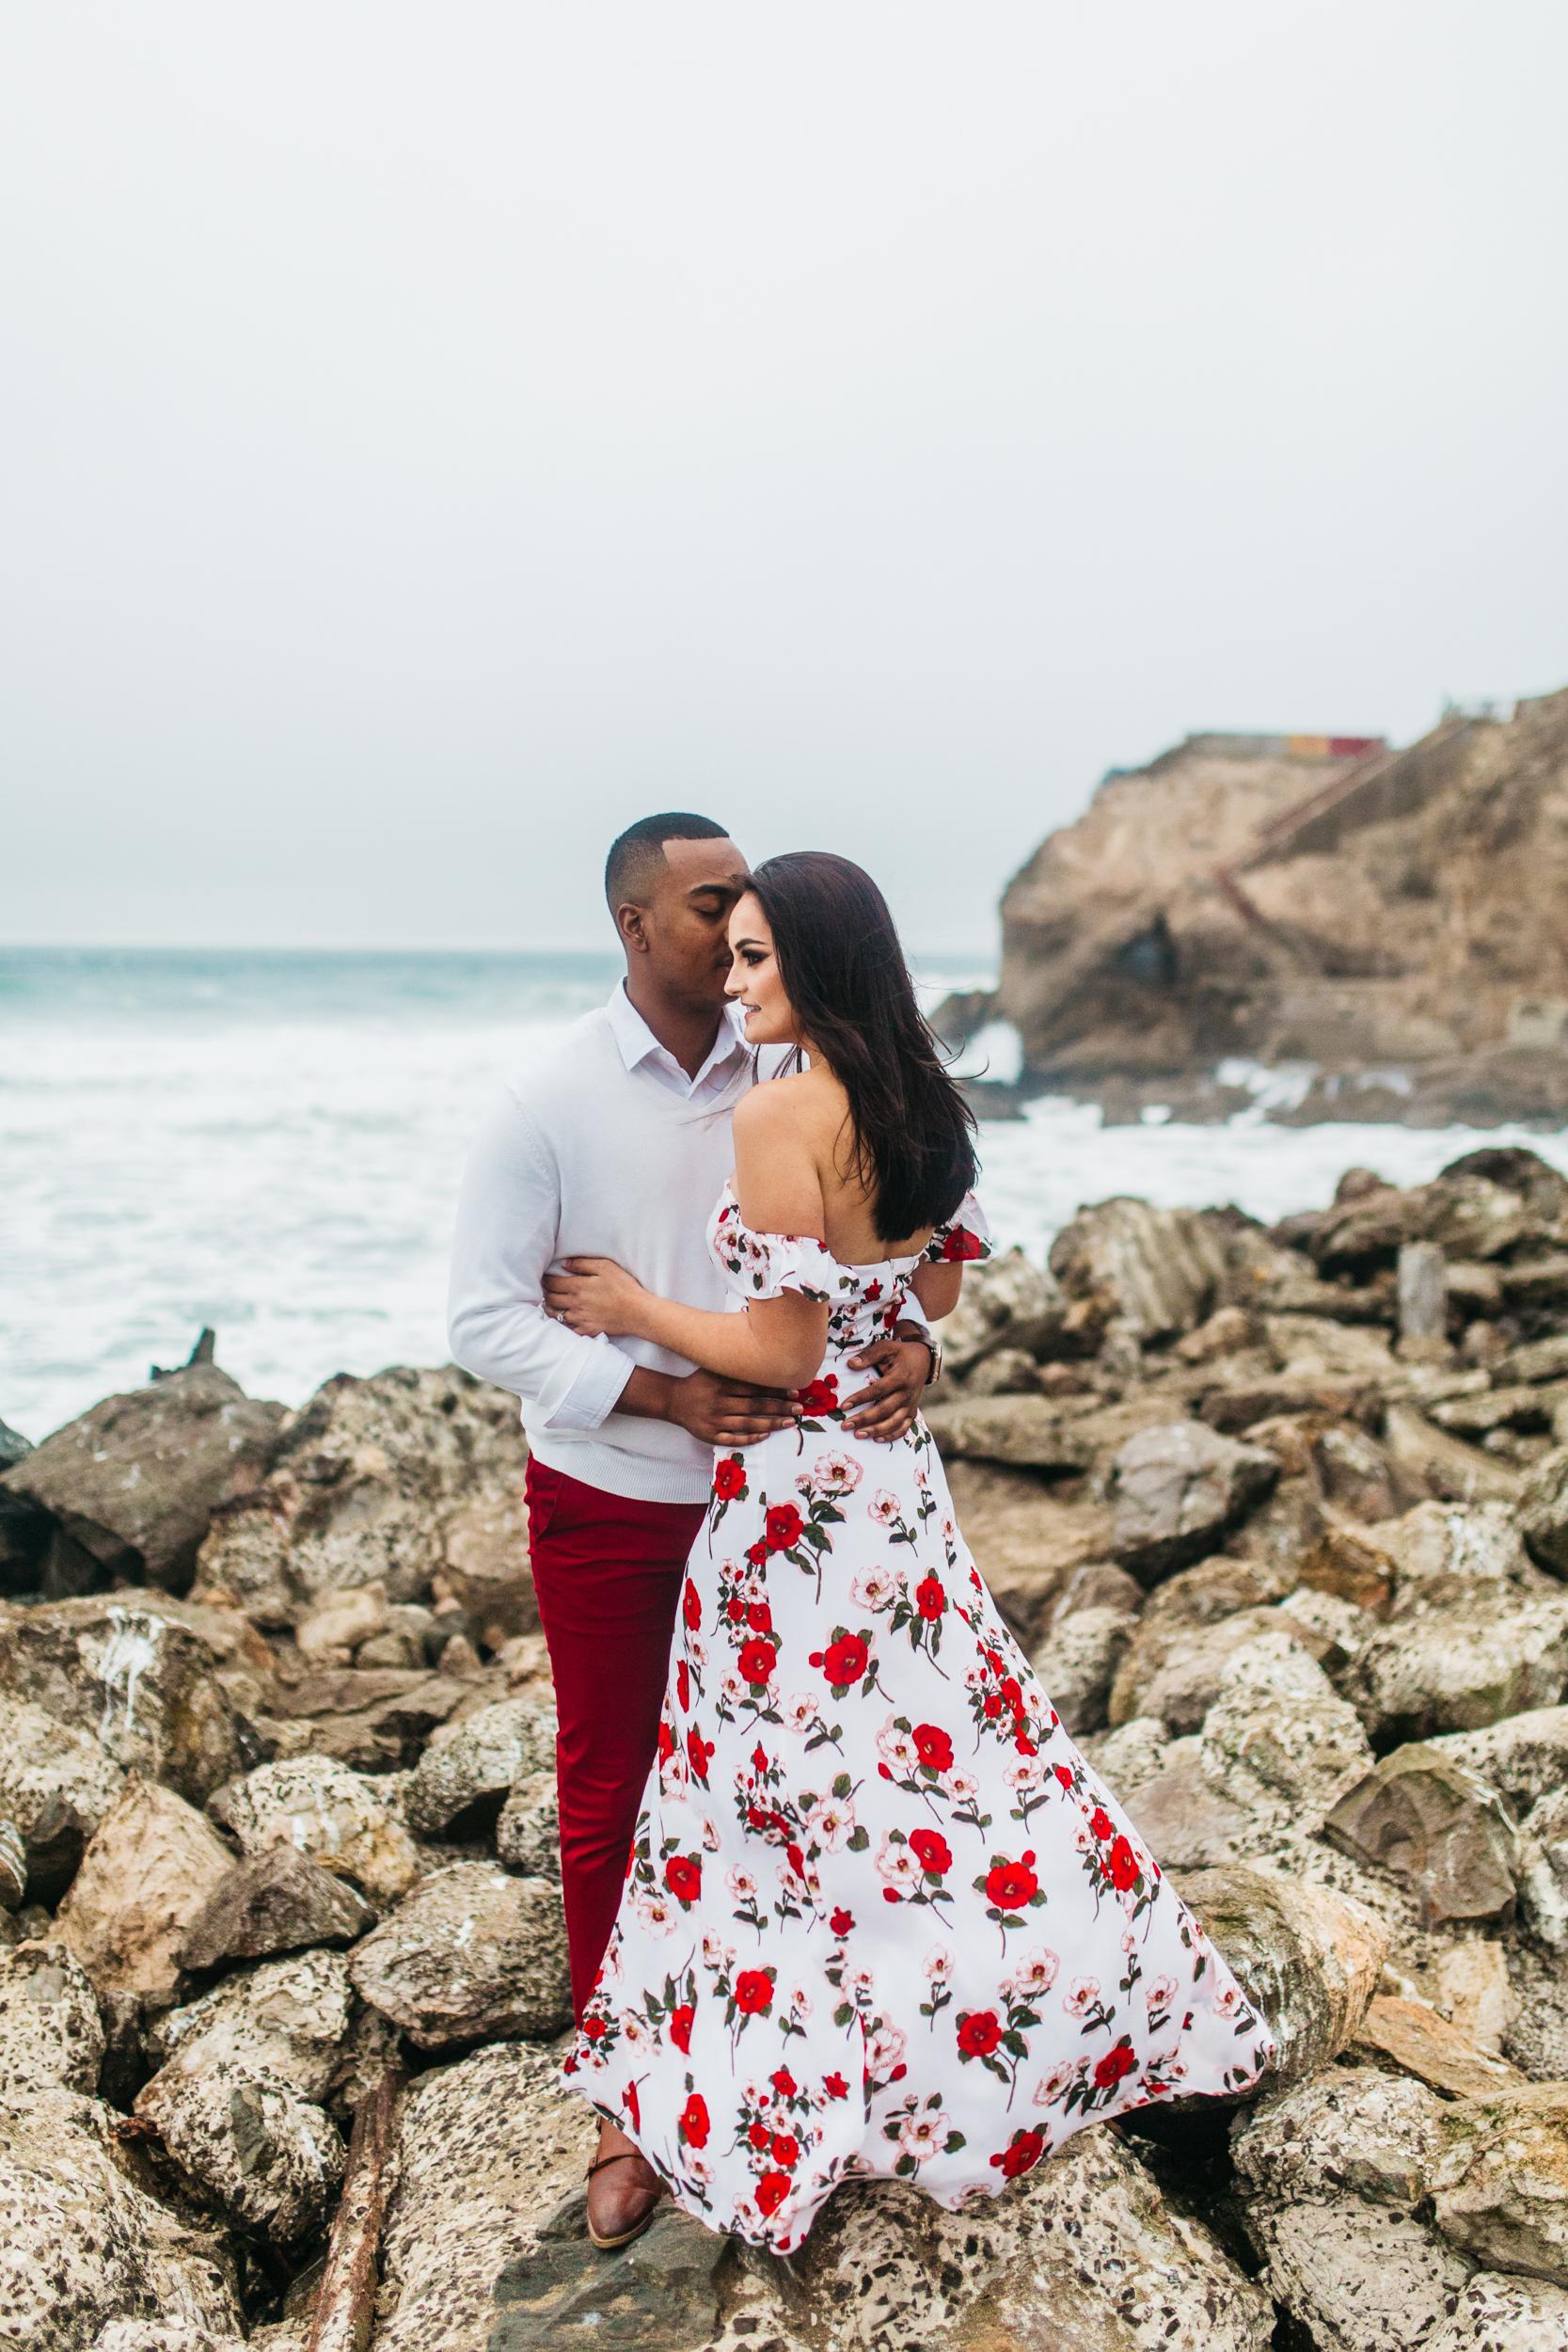 Engagement Photos-Ranalla Photo and Films-17.jpg